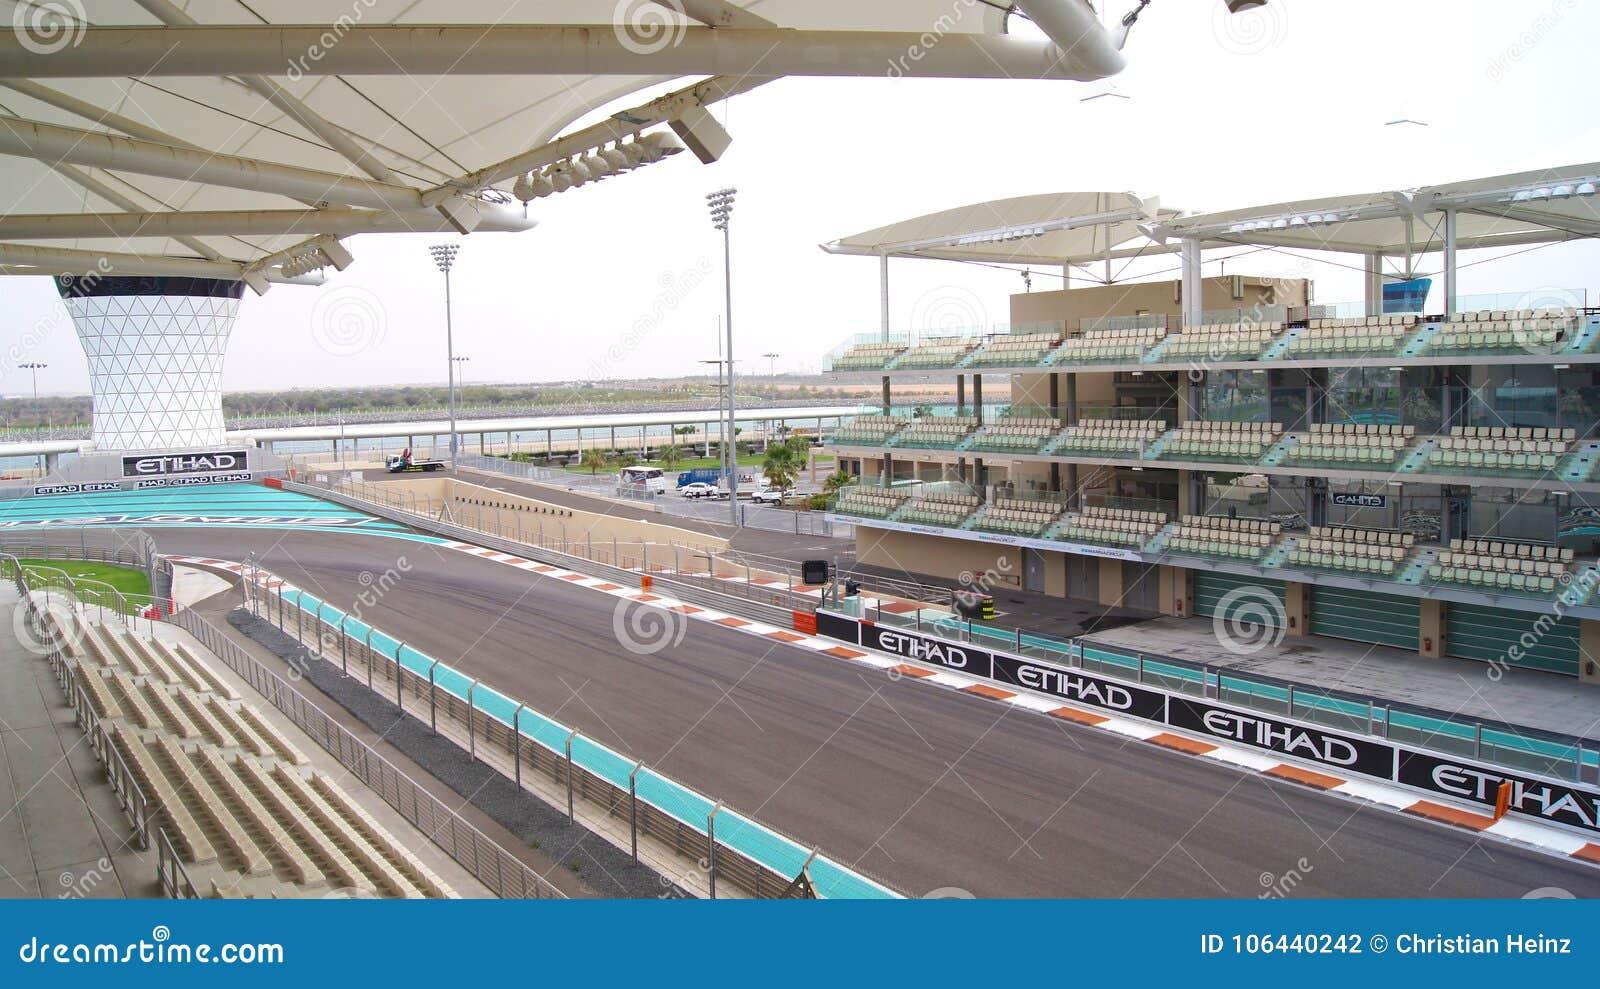 Circuito Yas Marina : Abu dhabi united arab emirates 4 de abril de 2014: el yas marina